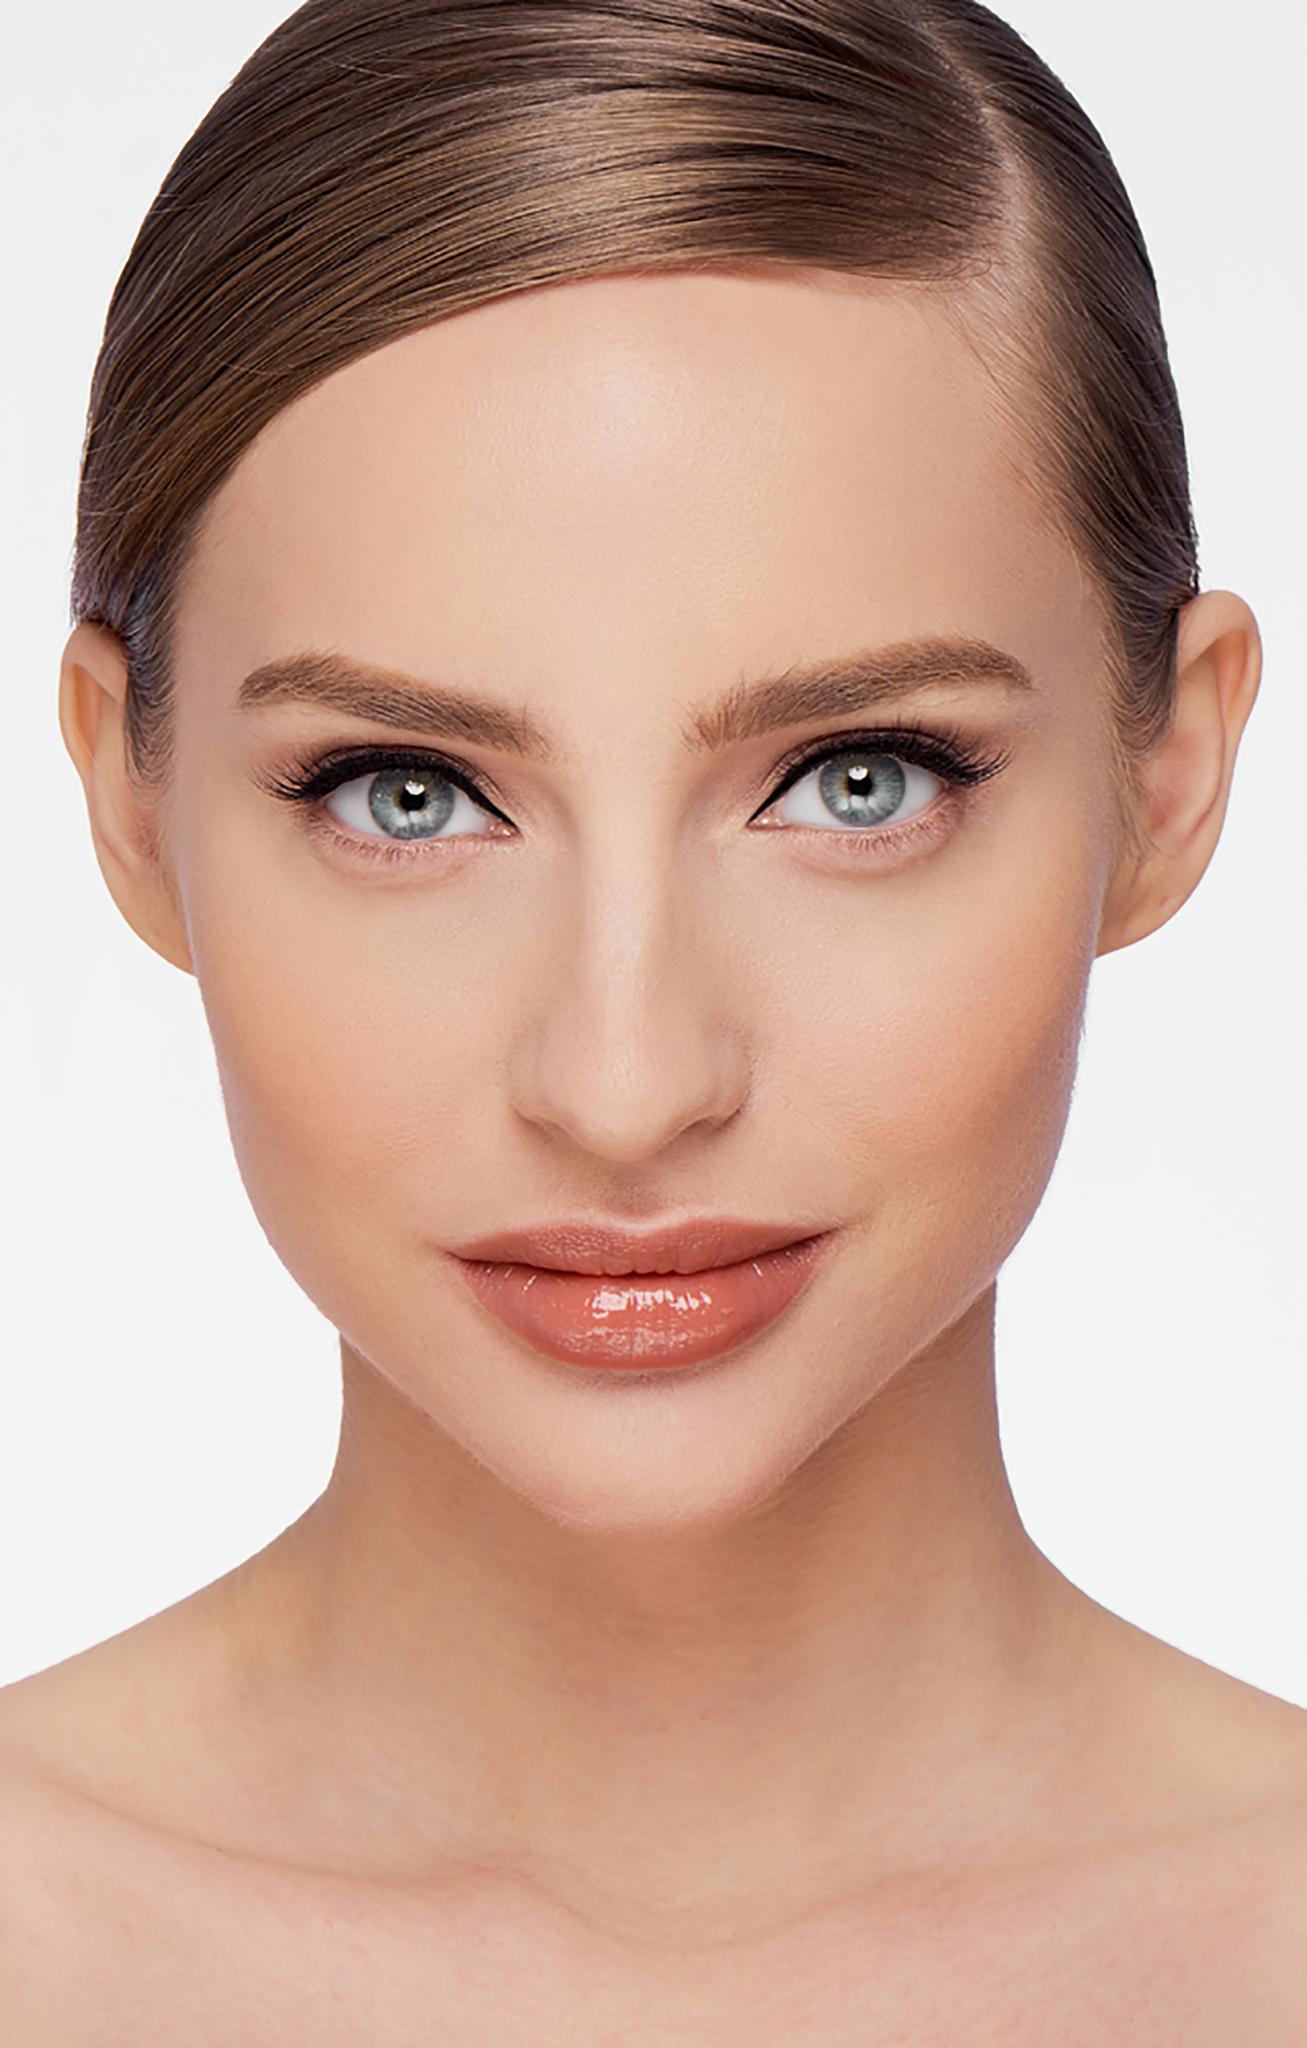 Блеск-тинт для губ Romanovamakeup Sexy Gloss Tint Dolce Vita